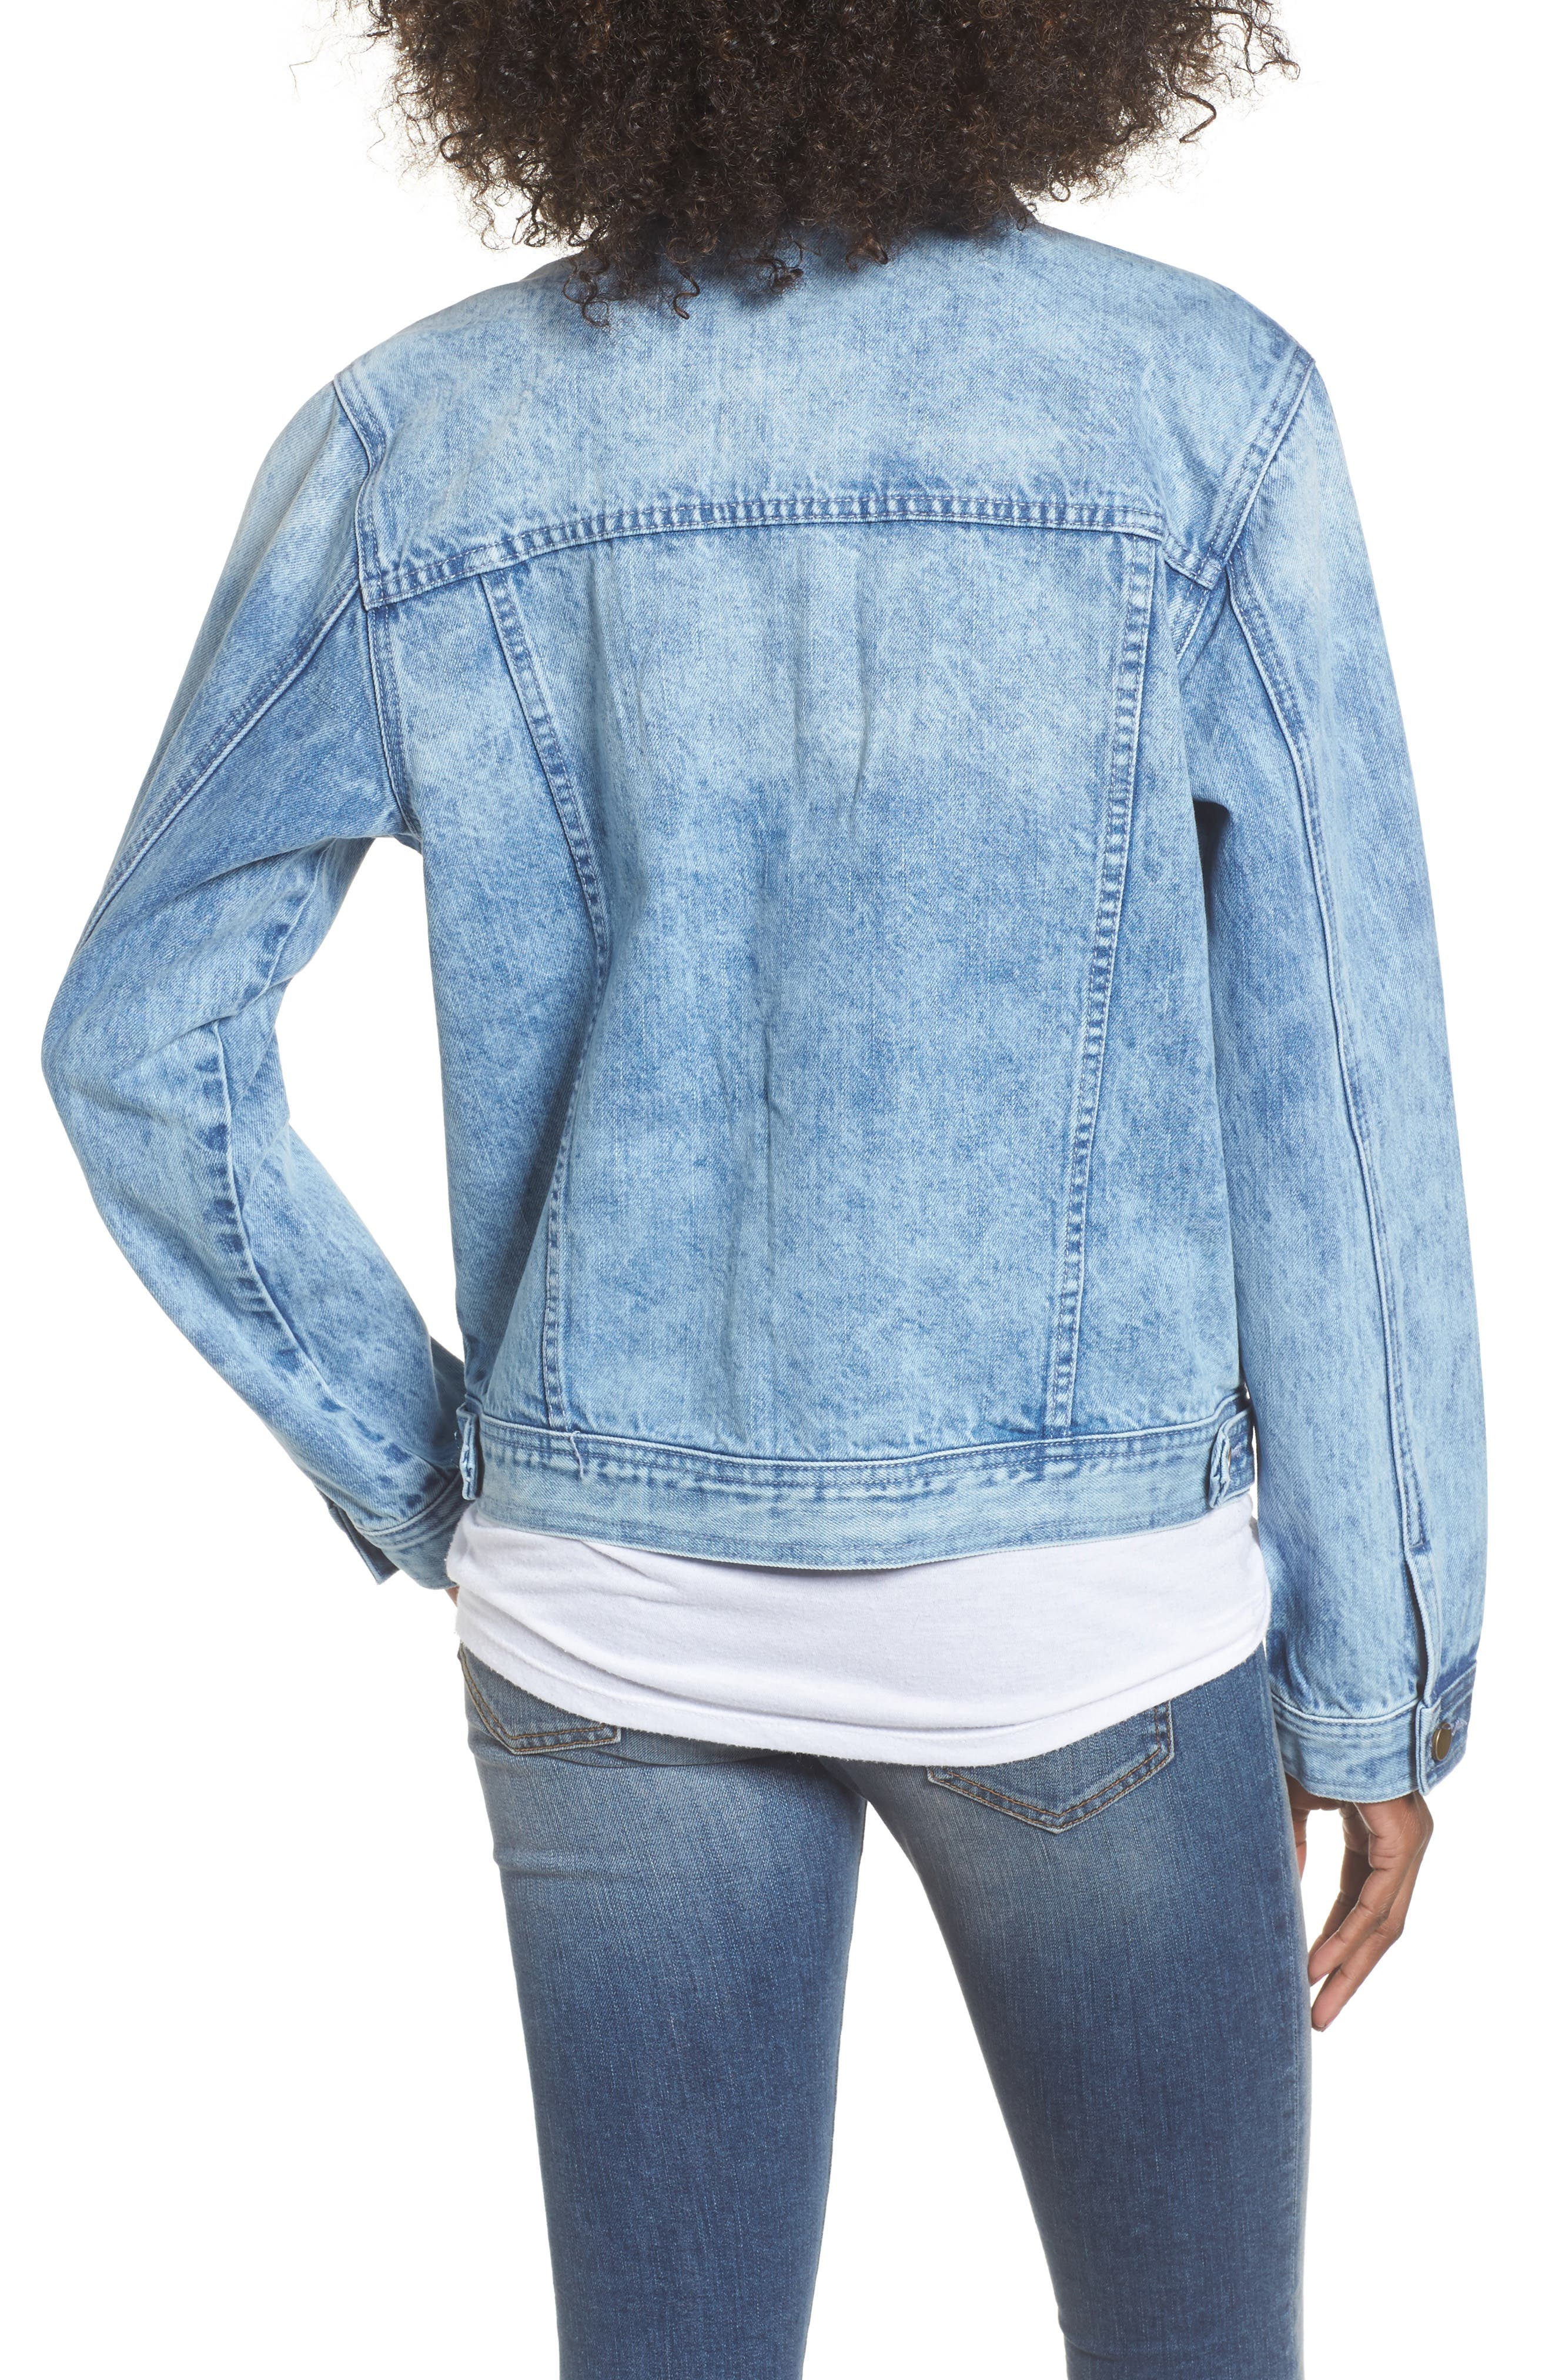 Star & Stud Denim Jacket,                             Alternate thumbnail 2, color,                             Blue